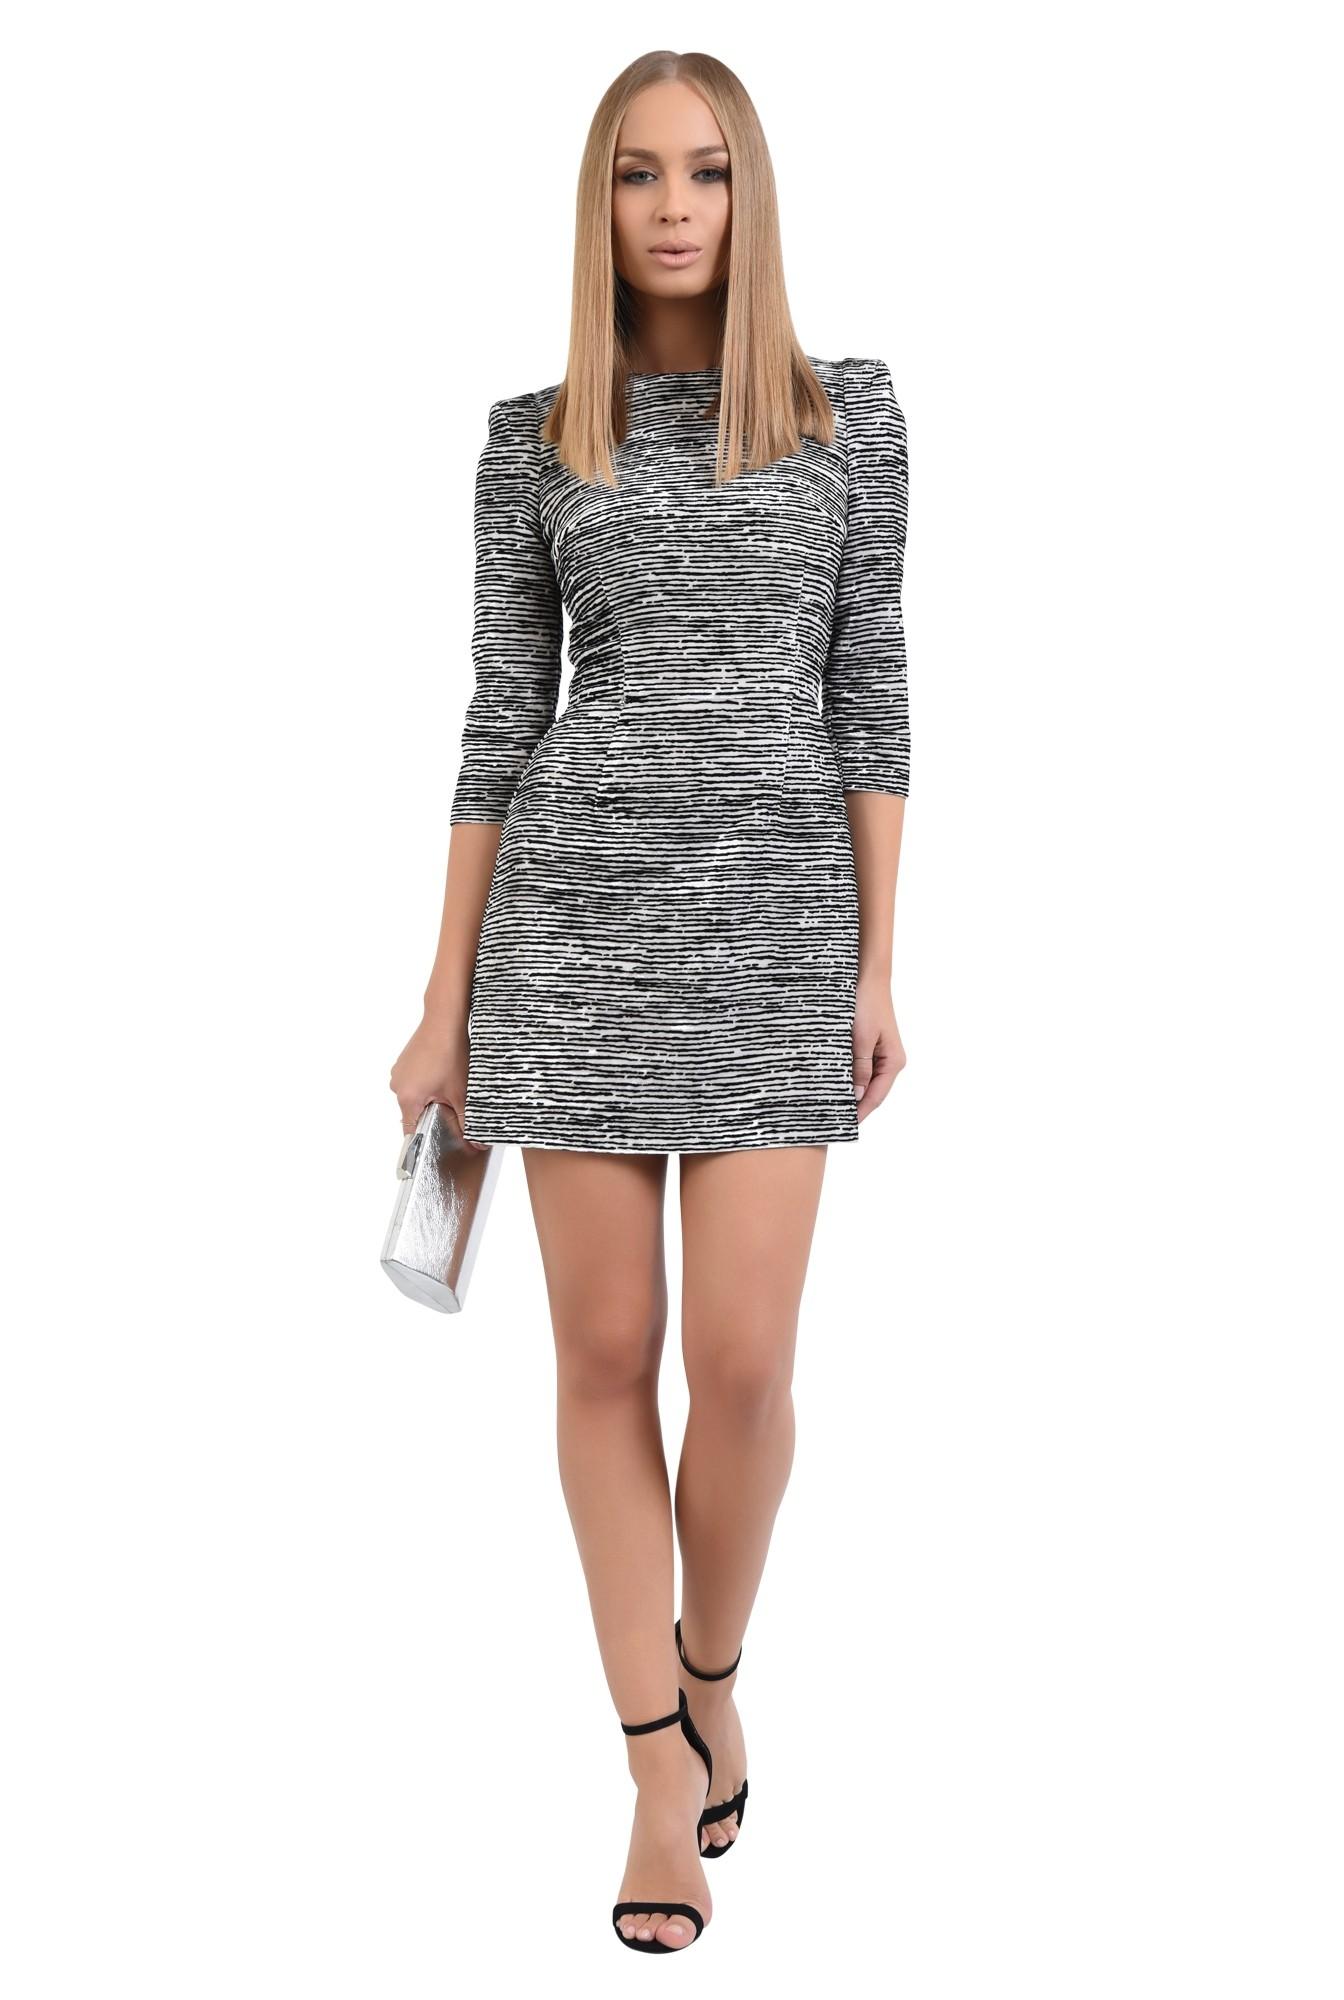 3 - 360 - rochie mini, animal print, zebra, alb-negru